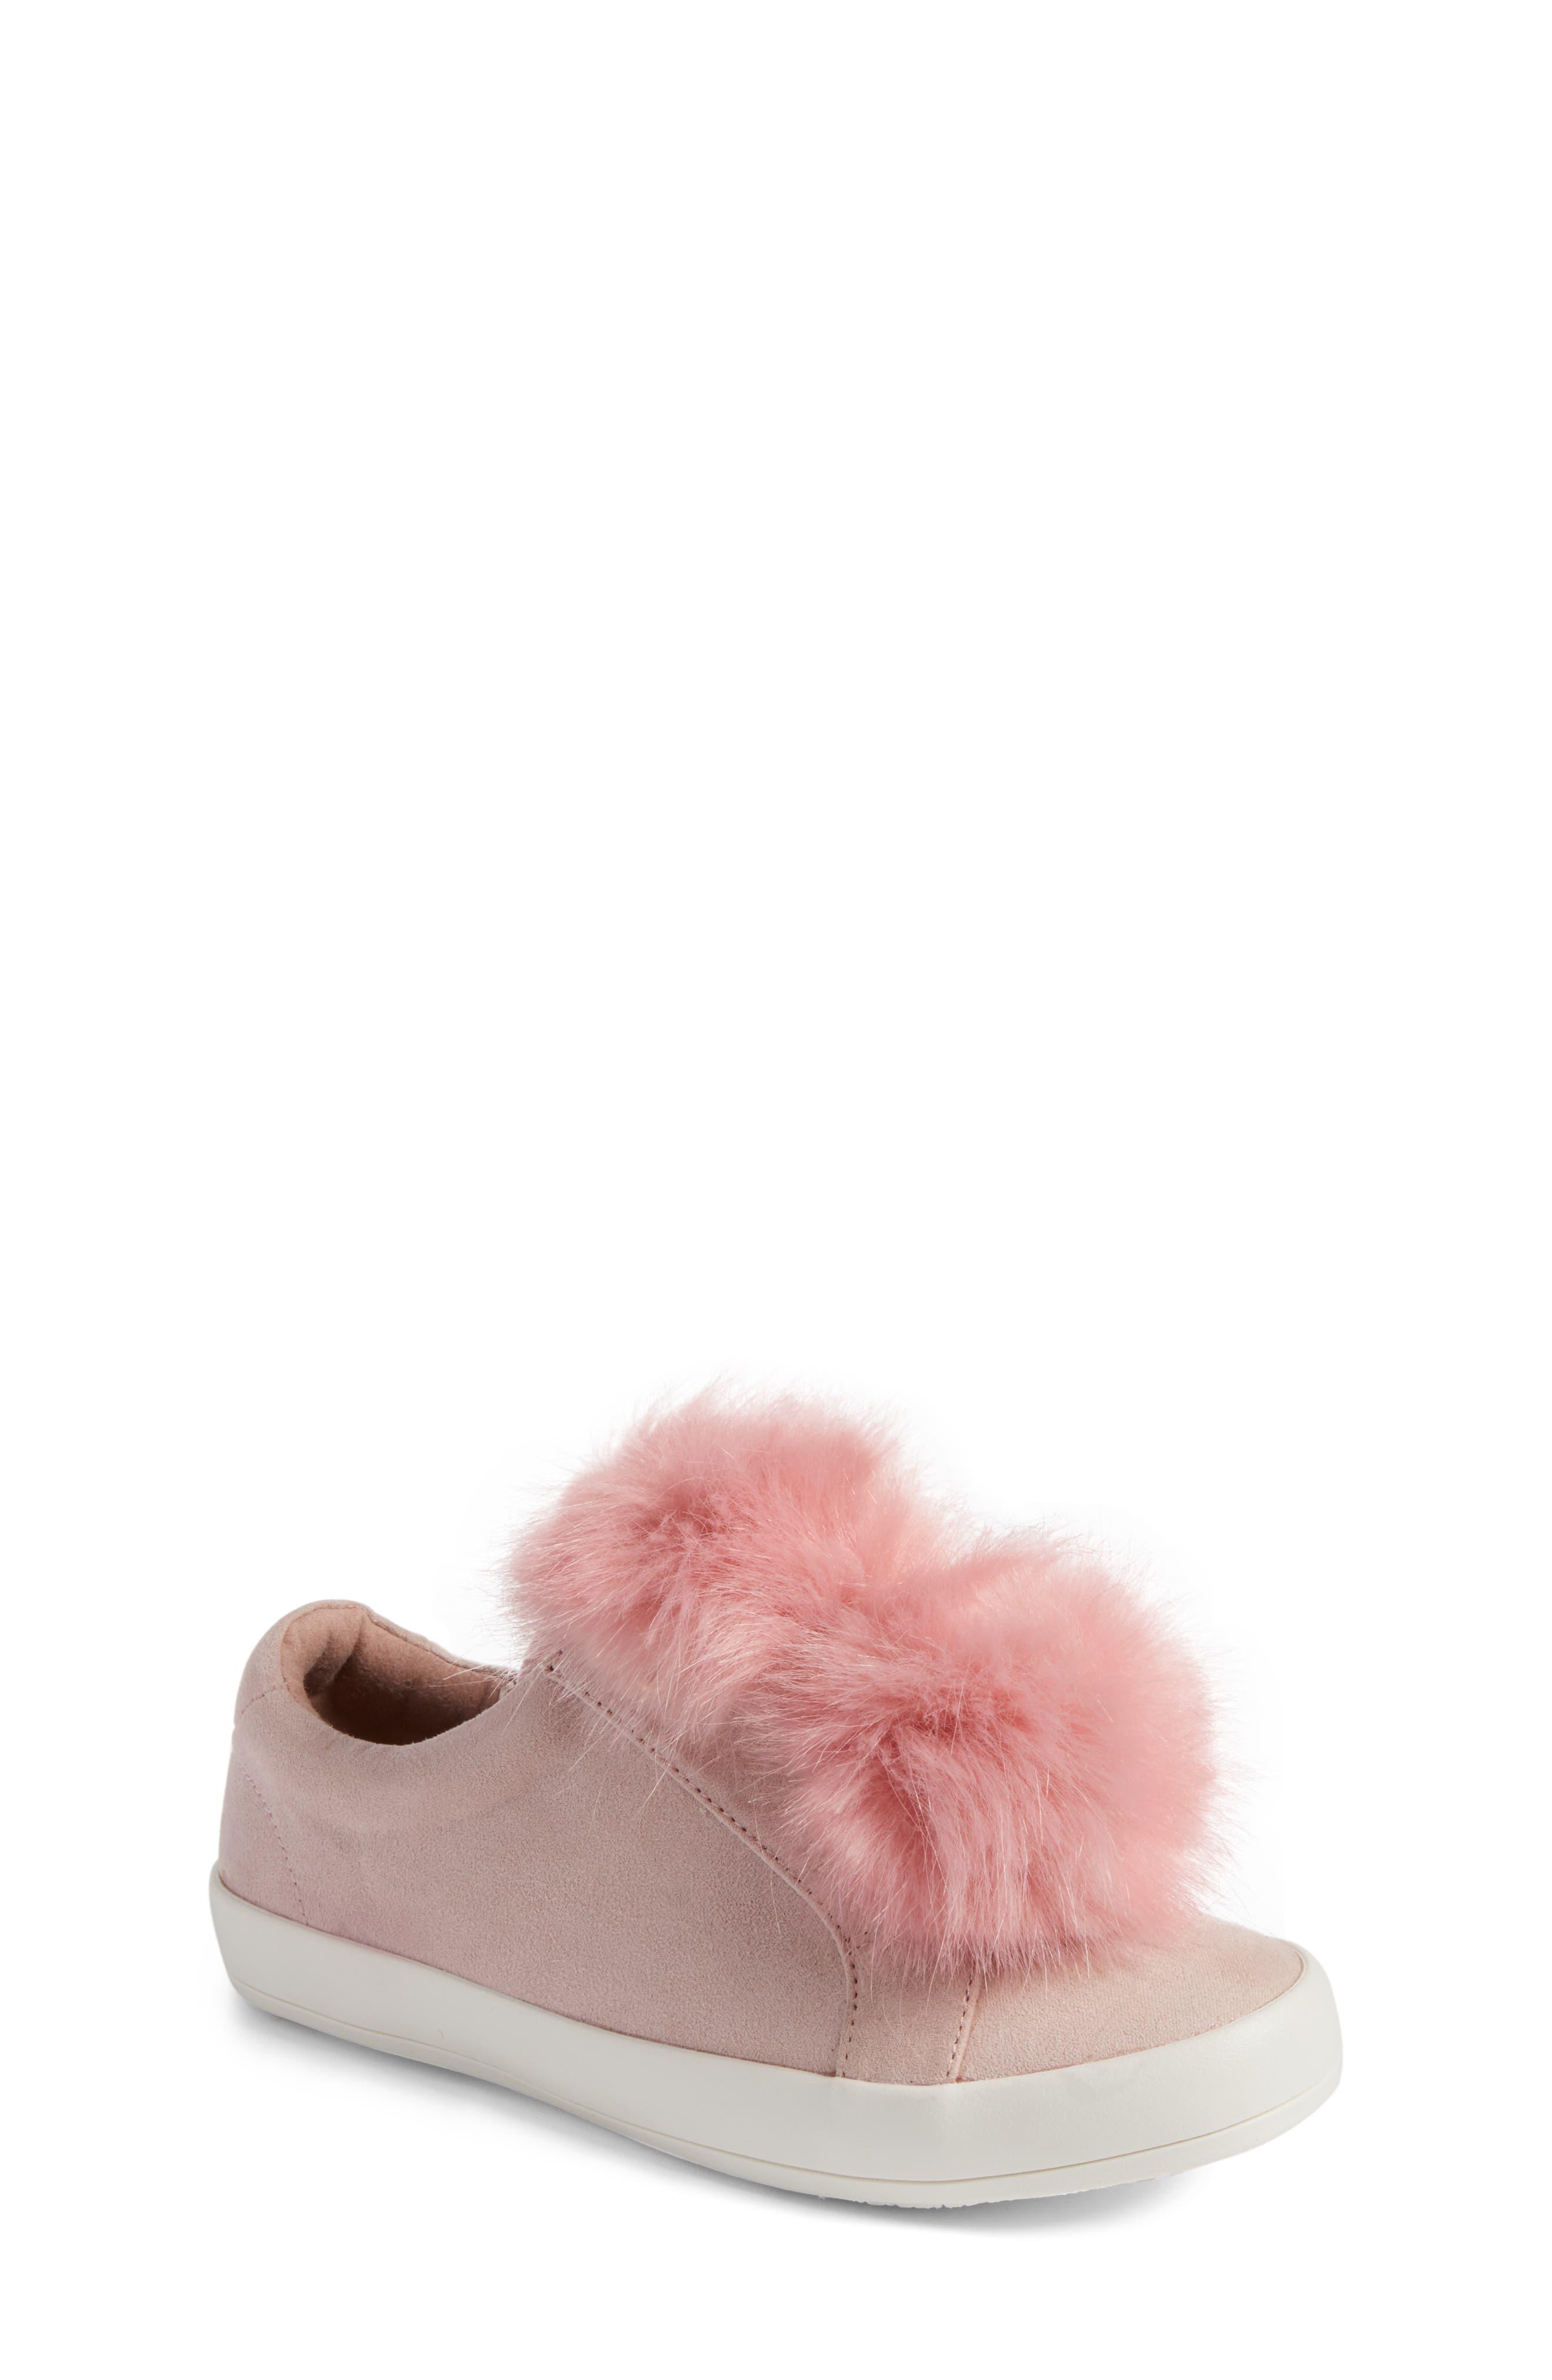 Alternate Image 1 Selected - Sam Edelman Cynthia Leya Faux Fur Pompom Slip-On Sneaker (Toddler, Little Kid & Big Kid)